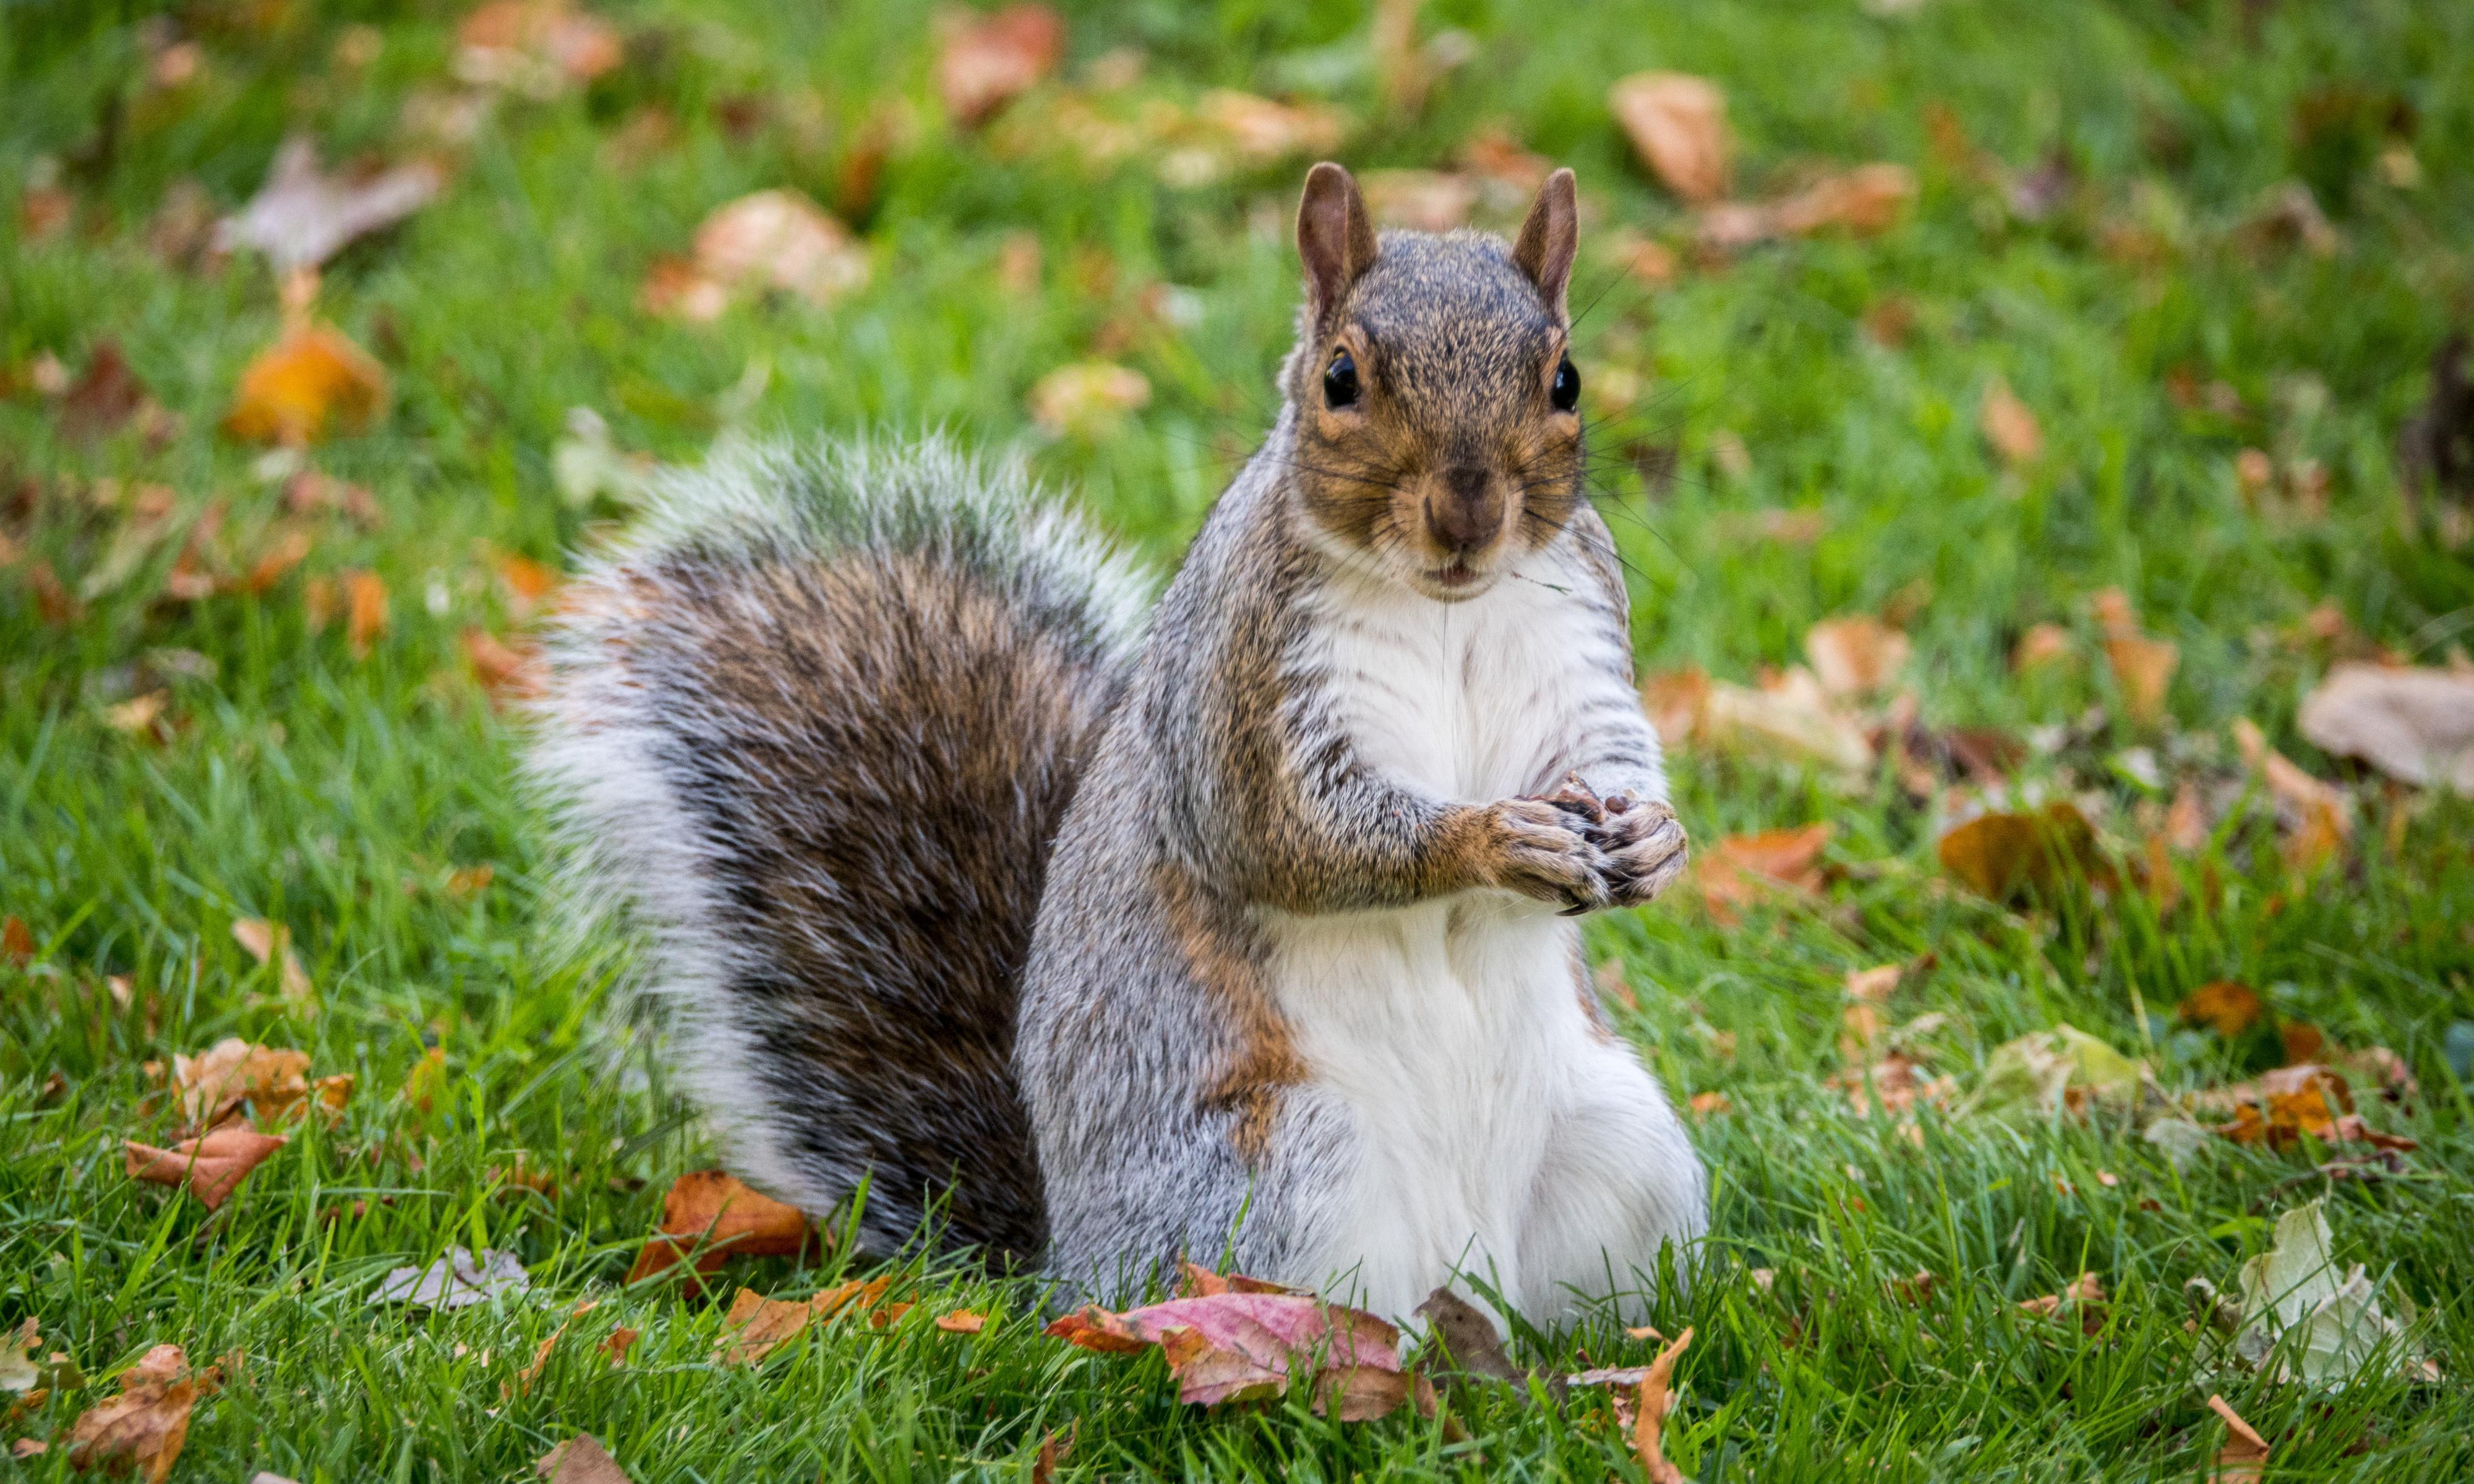 Alabama man accused of feeding caged 'attack squirrel' meth